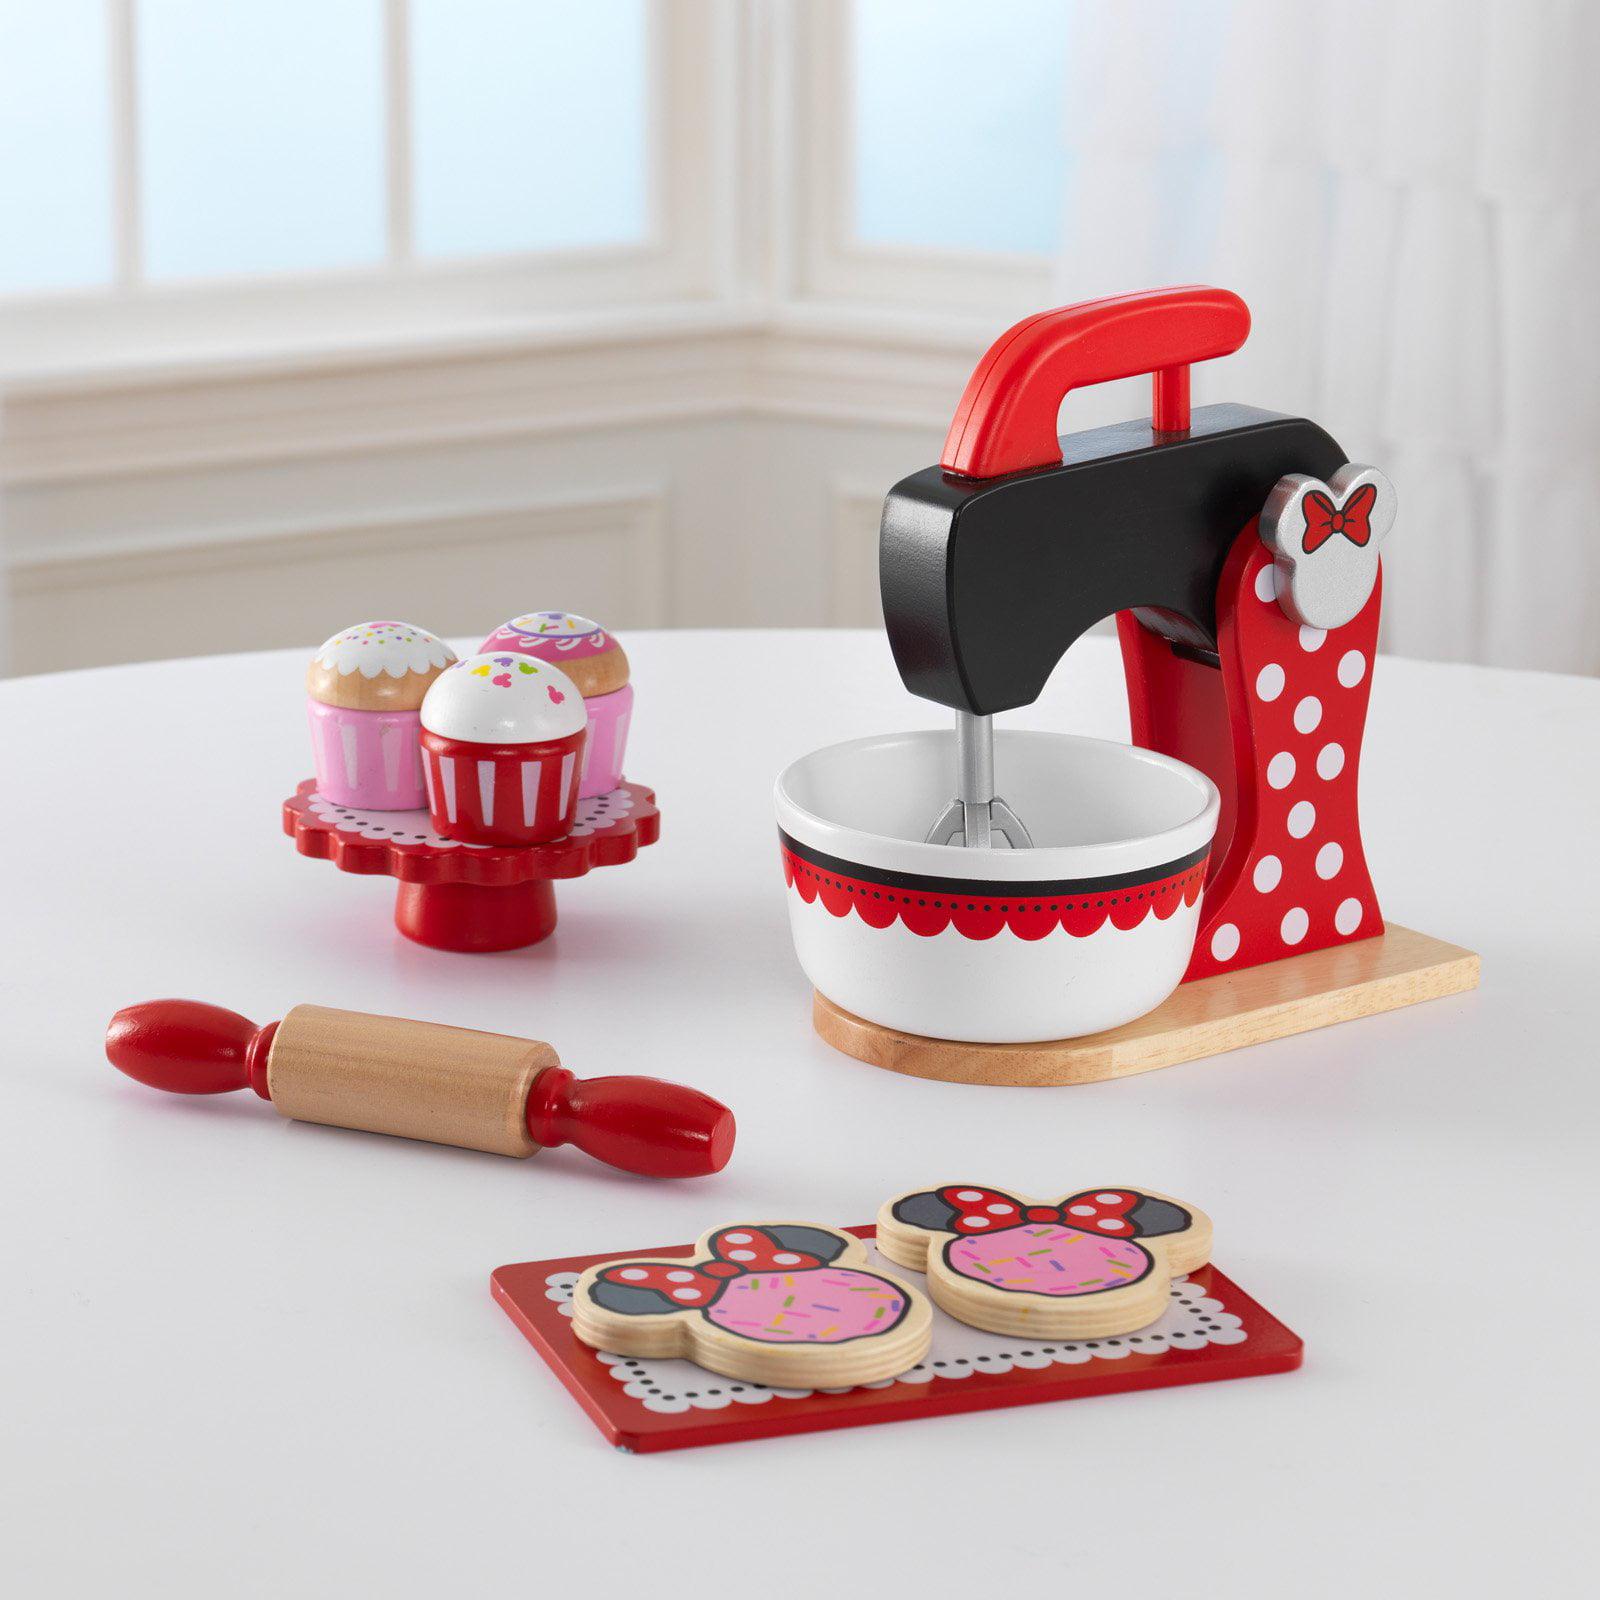 KidKraft Deluxe Minnie Mouse Baking Set + Treats by KidKraft